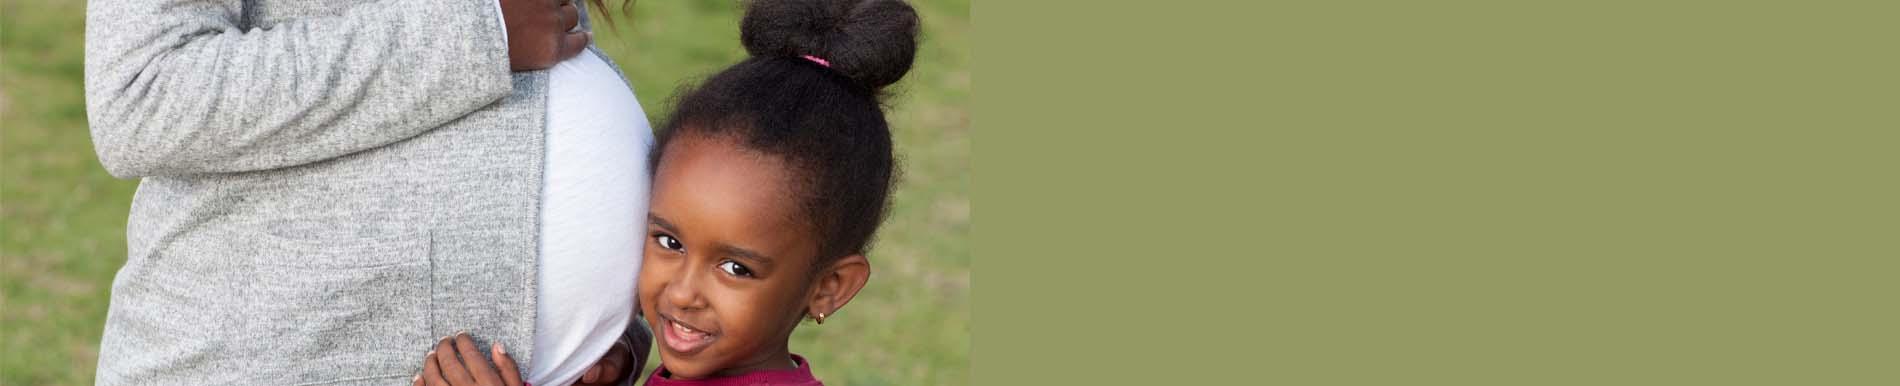 https://www.healthychildren.org/SiteCollectionImage-Homepage-Banners/Reduce_Birth_Defects_Banner.jpg